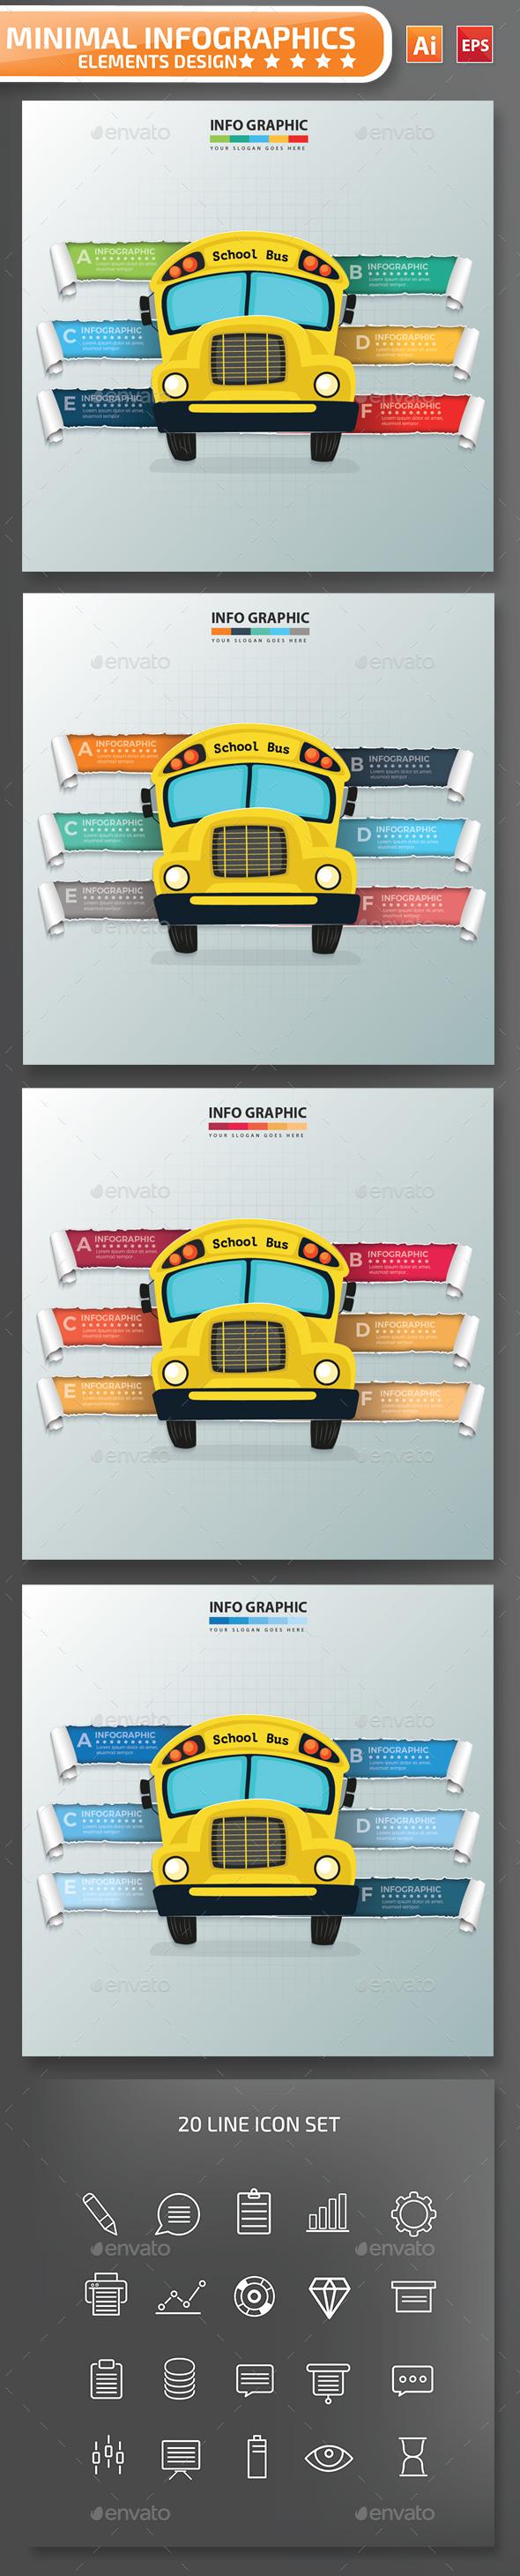 Minimal School Bus infographic Design - Infographics